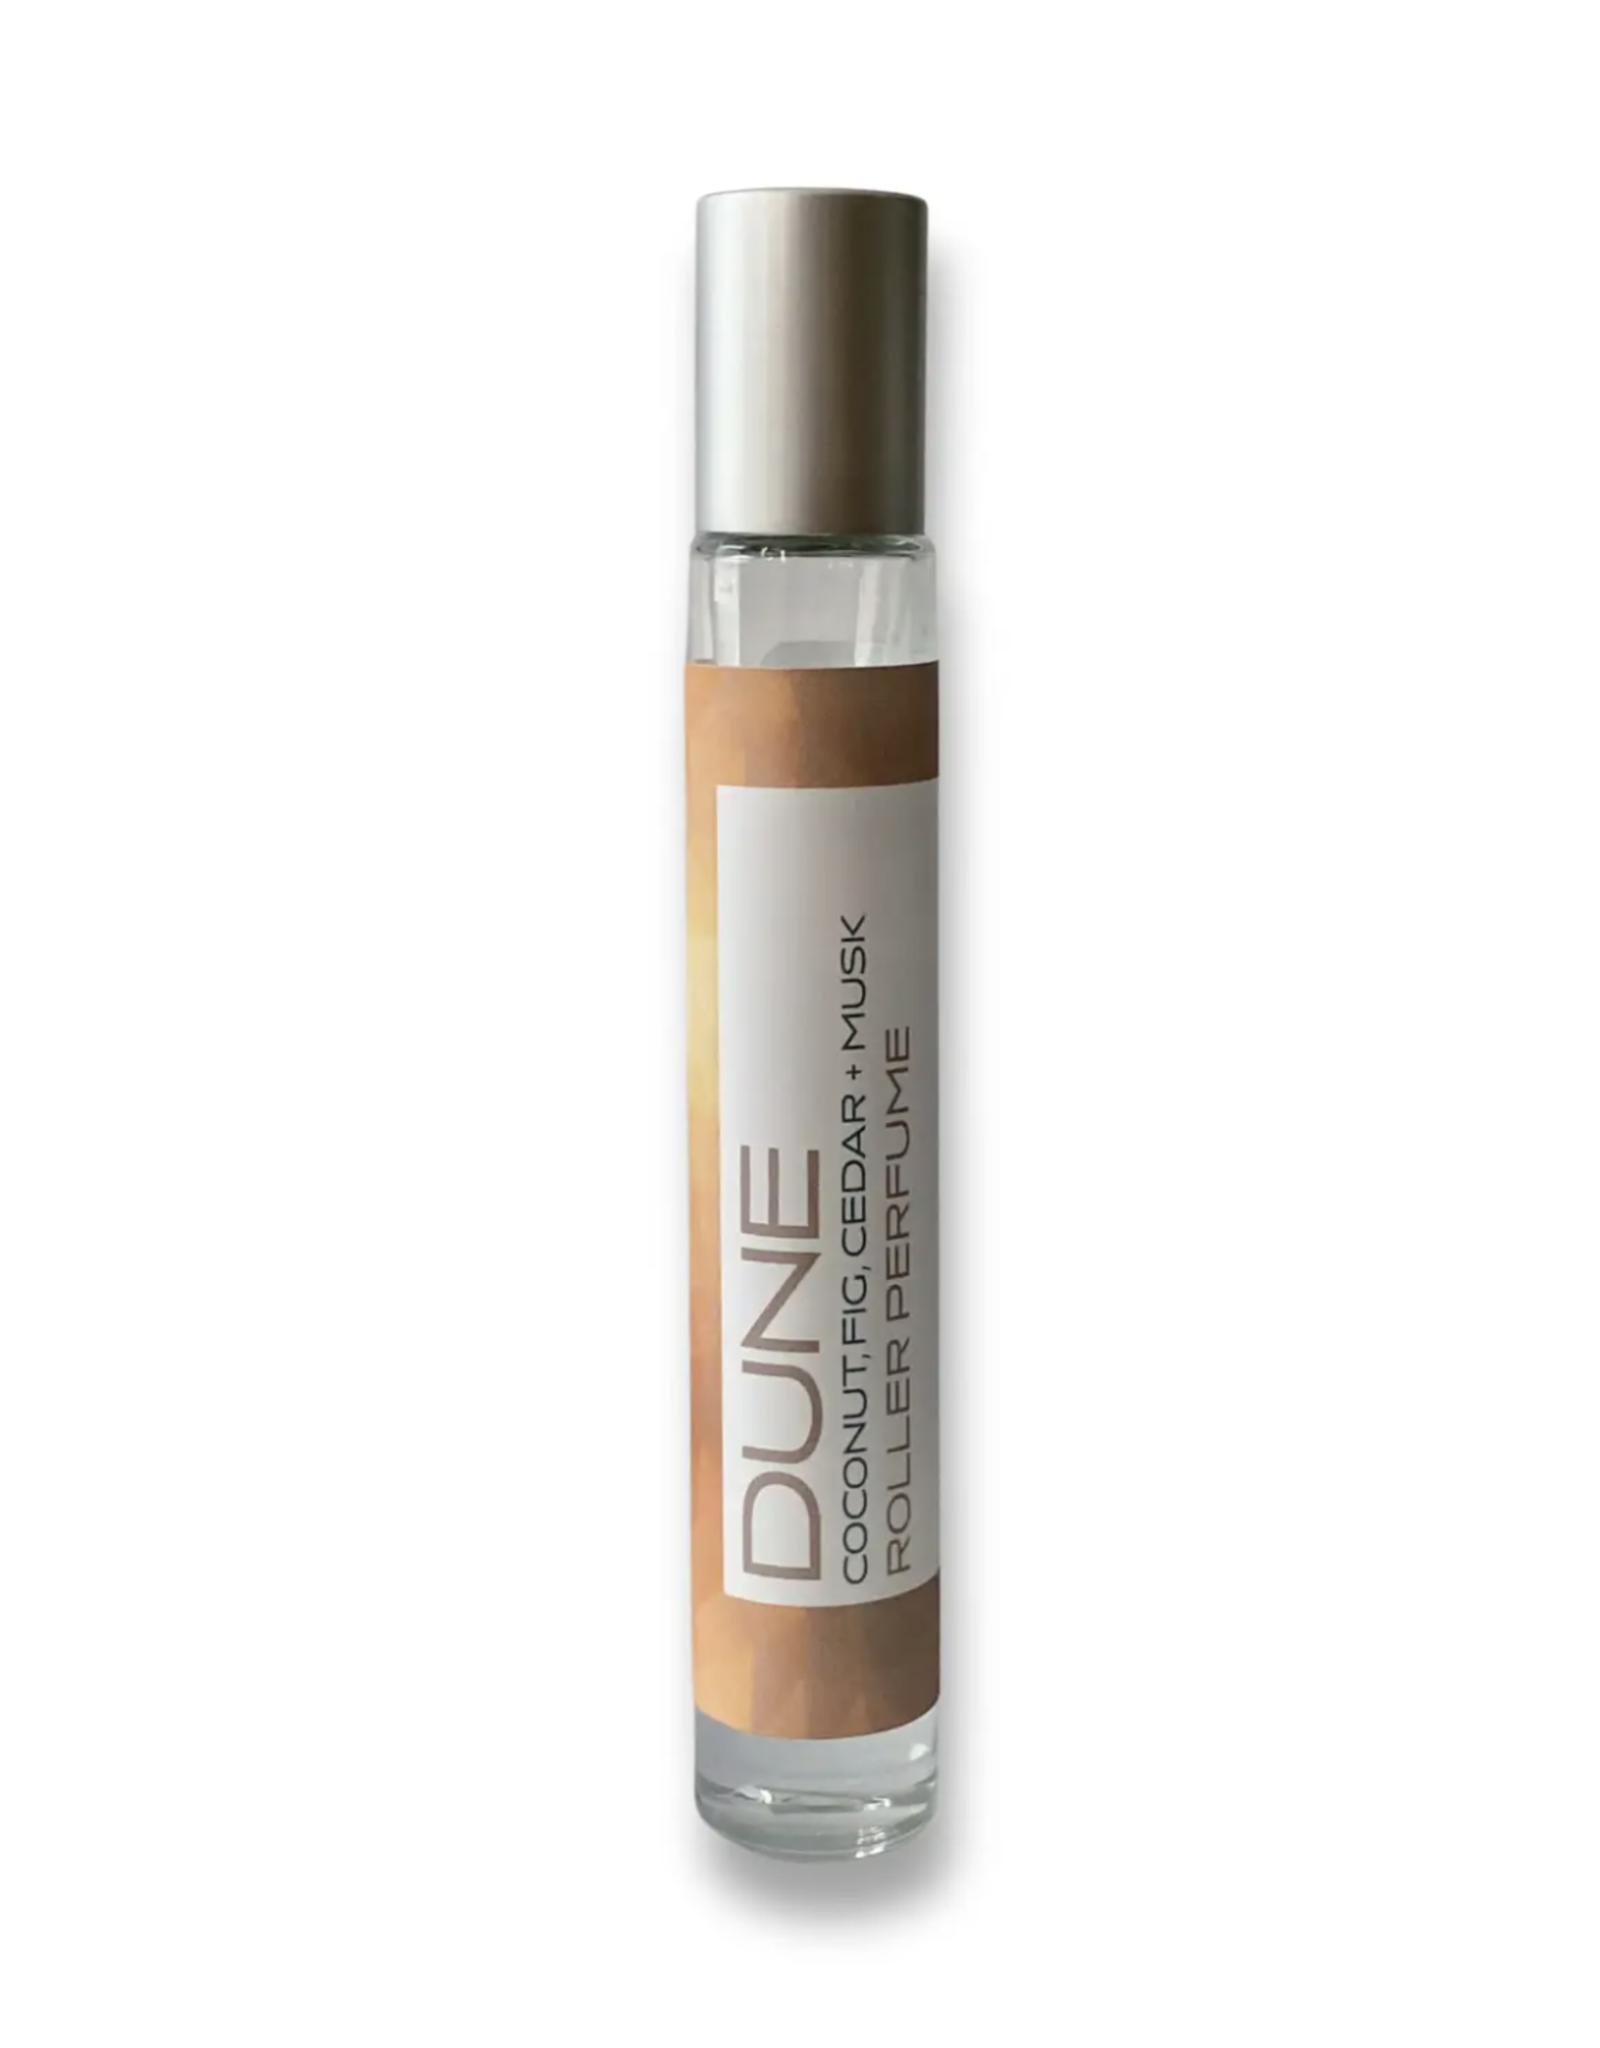 Dune roller perfume